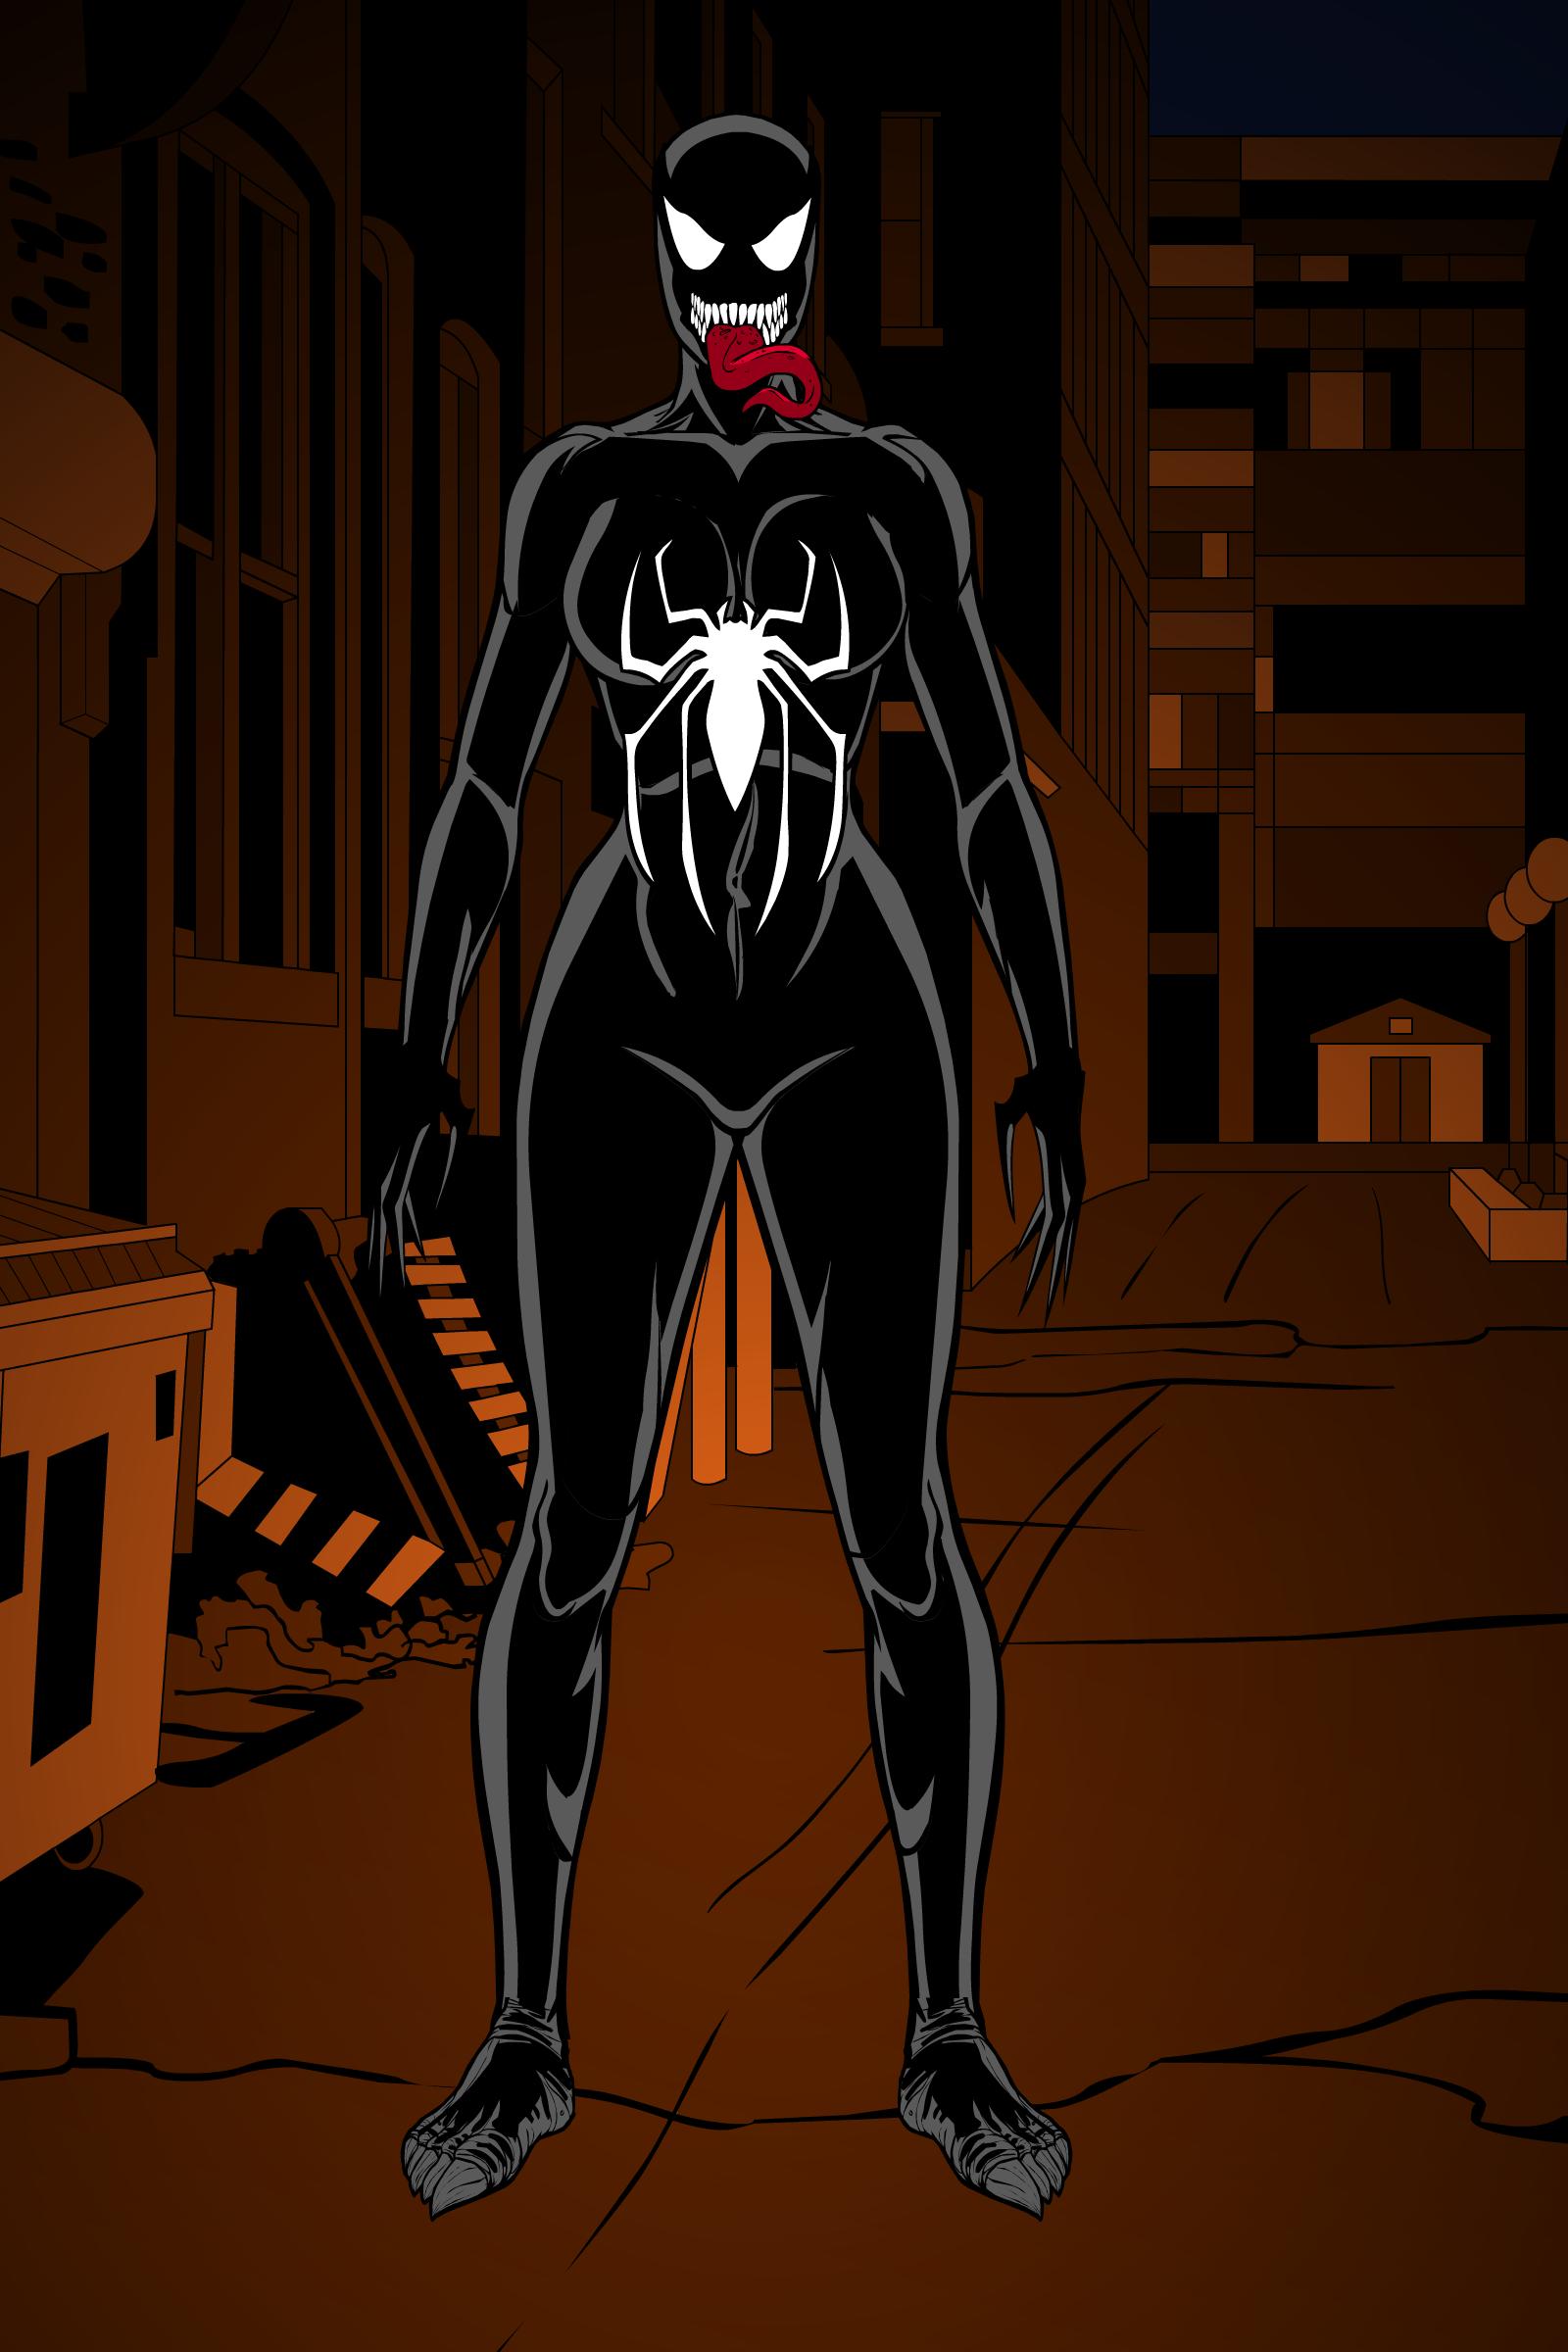 Spider girl - fullcolor by jotazombie on DeviantArt